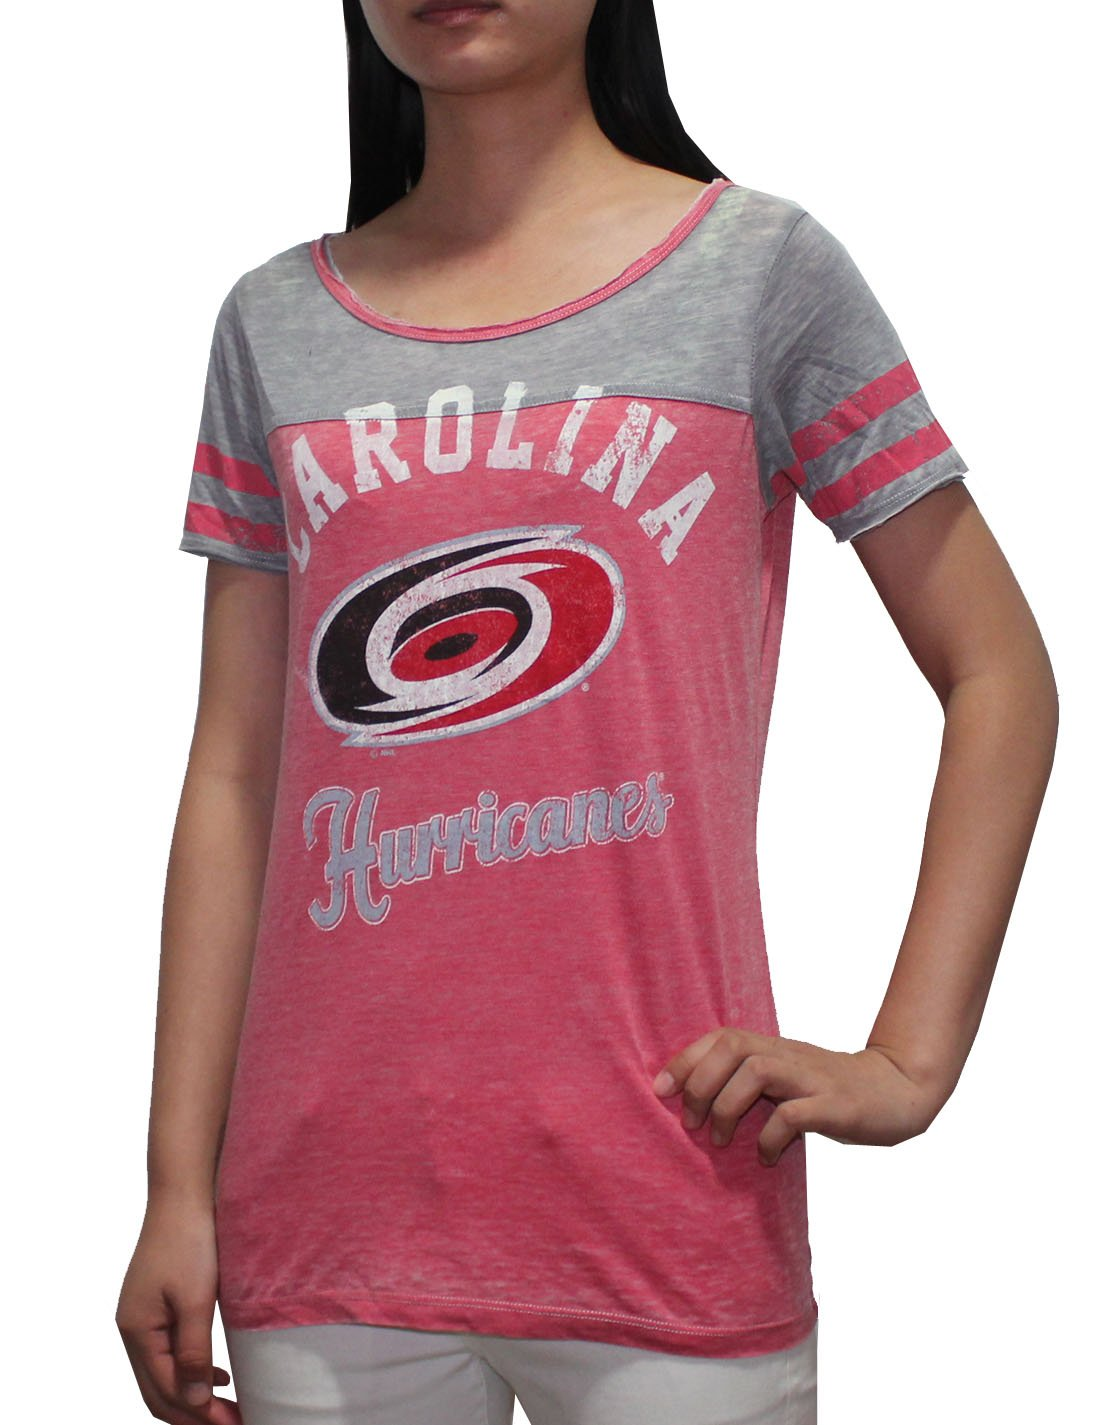 NHL Carolina Hurricanes Womens Crew-Neck Short Sleeve T Shirt (Vintage Look)